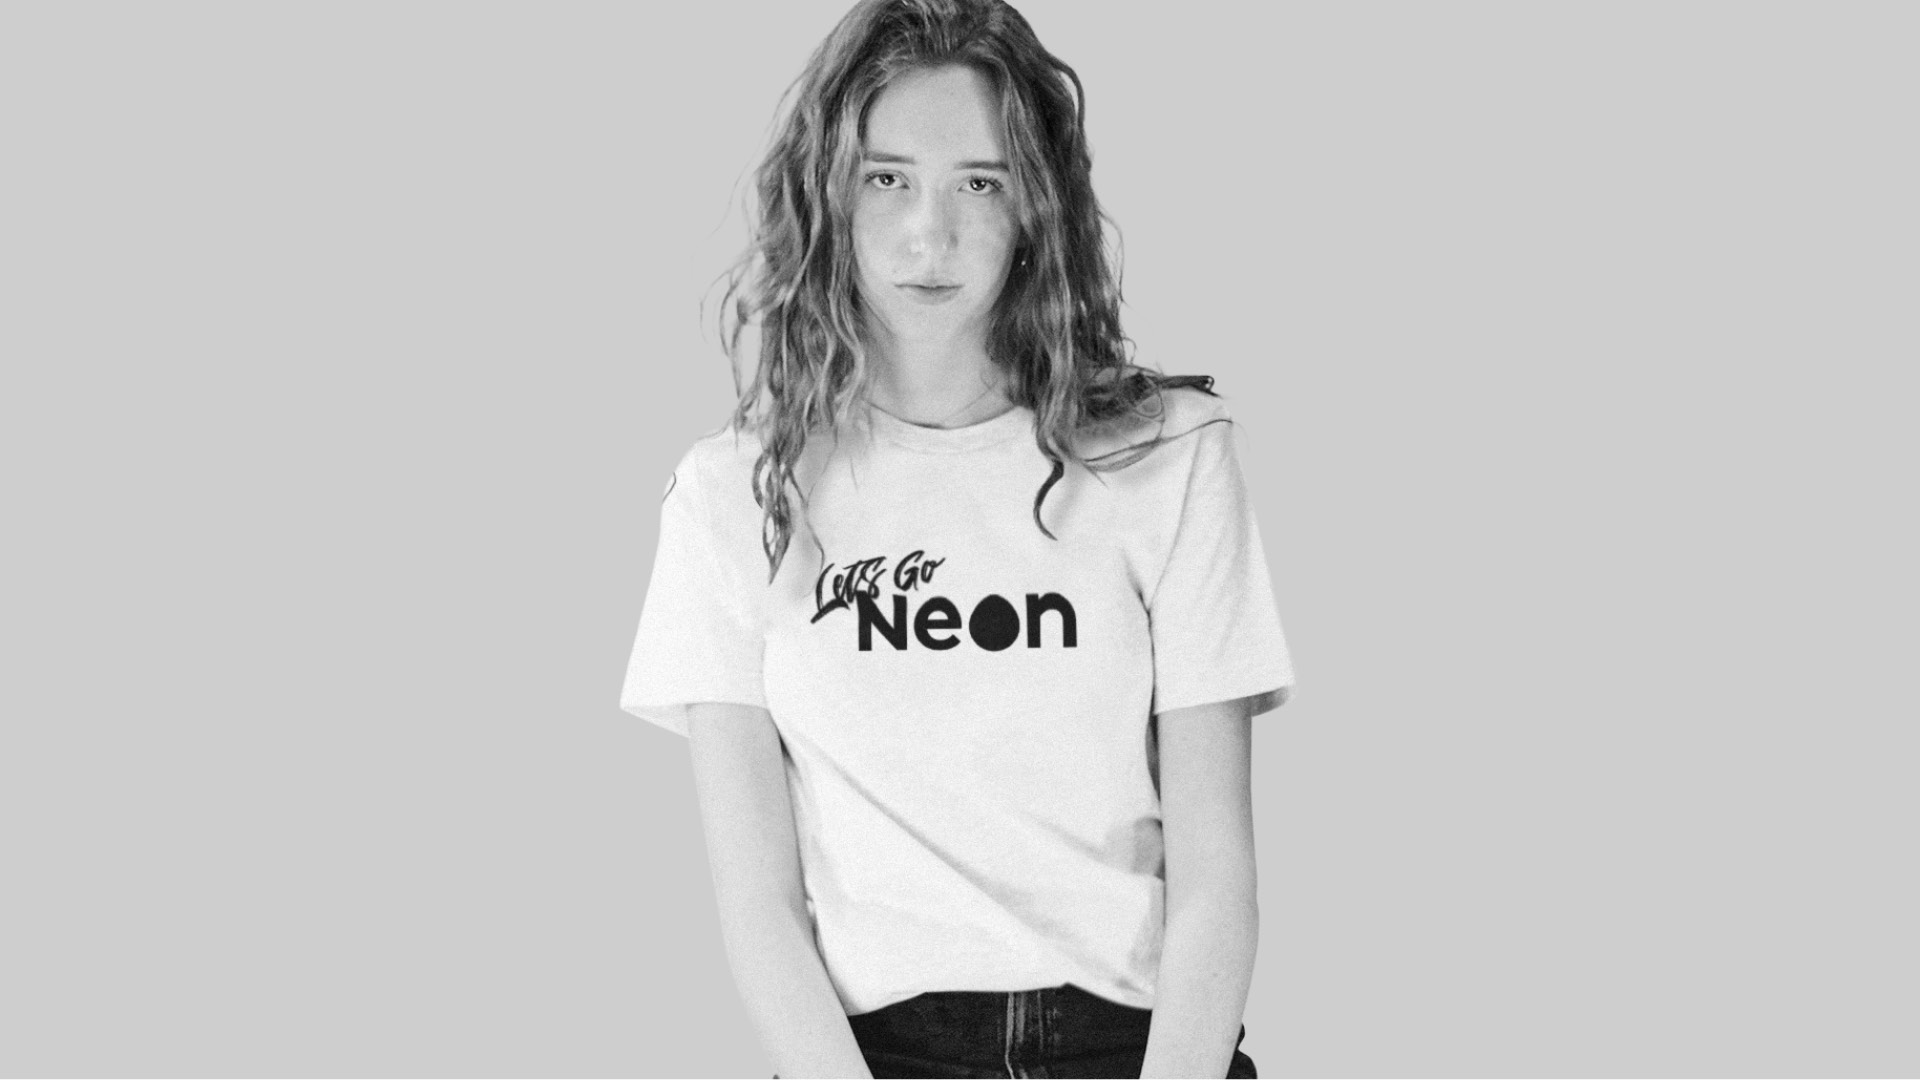 Merchandise Design Neon Shirt